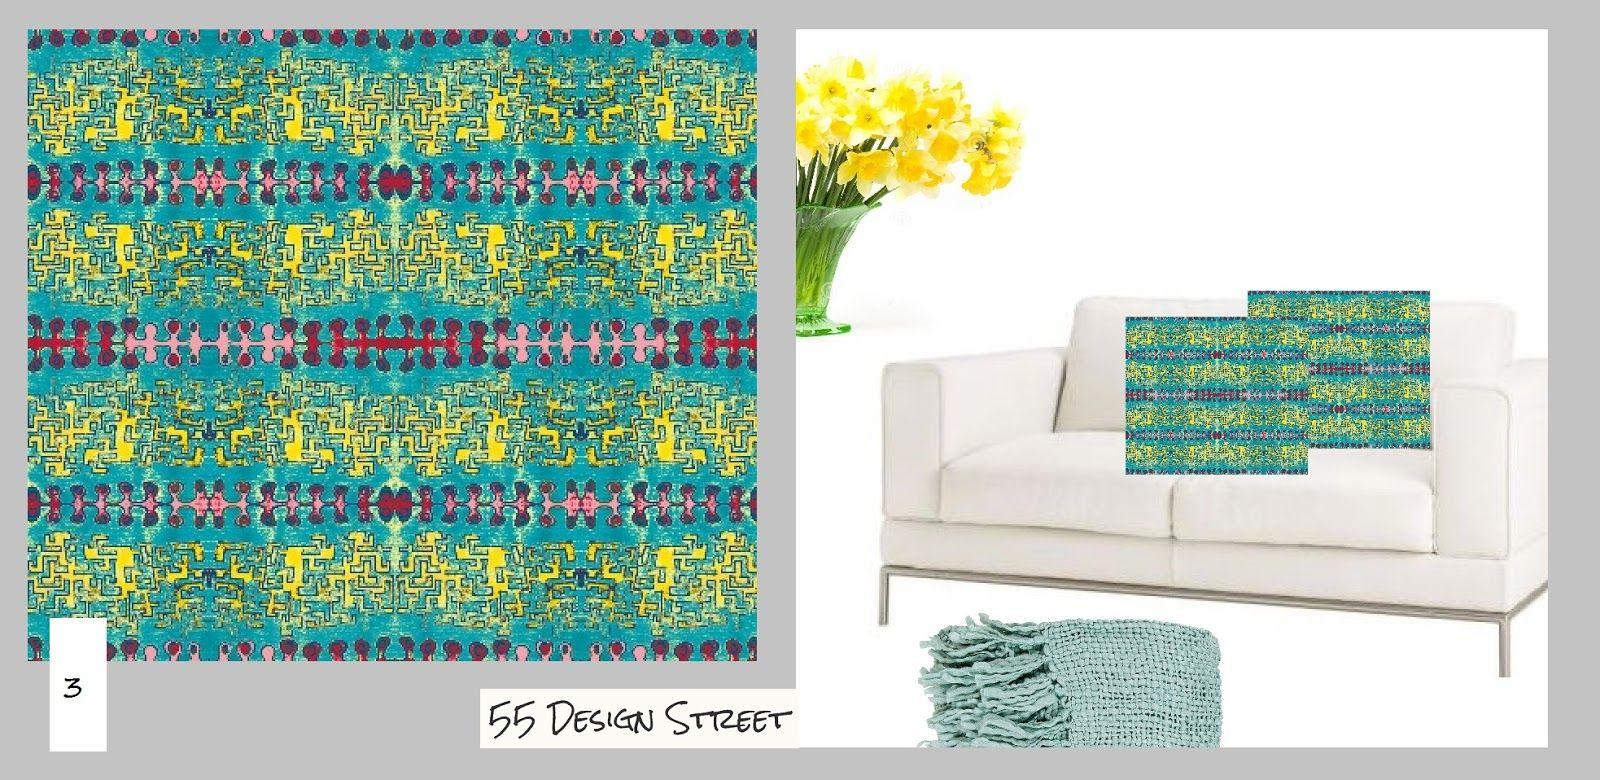 55 Design Street: Colour and more colour